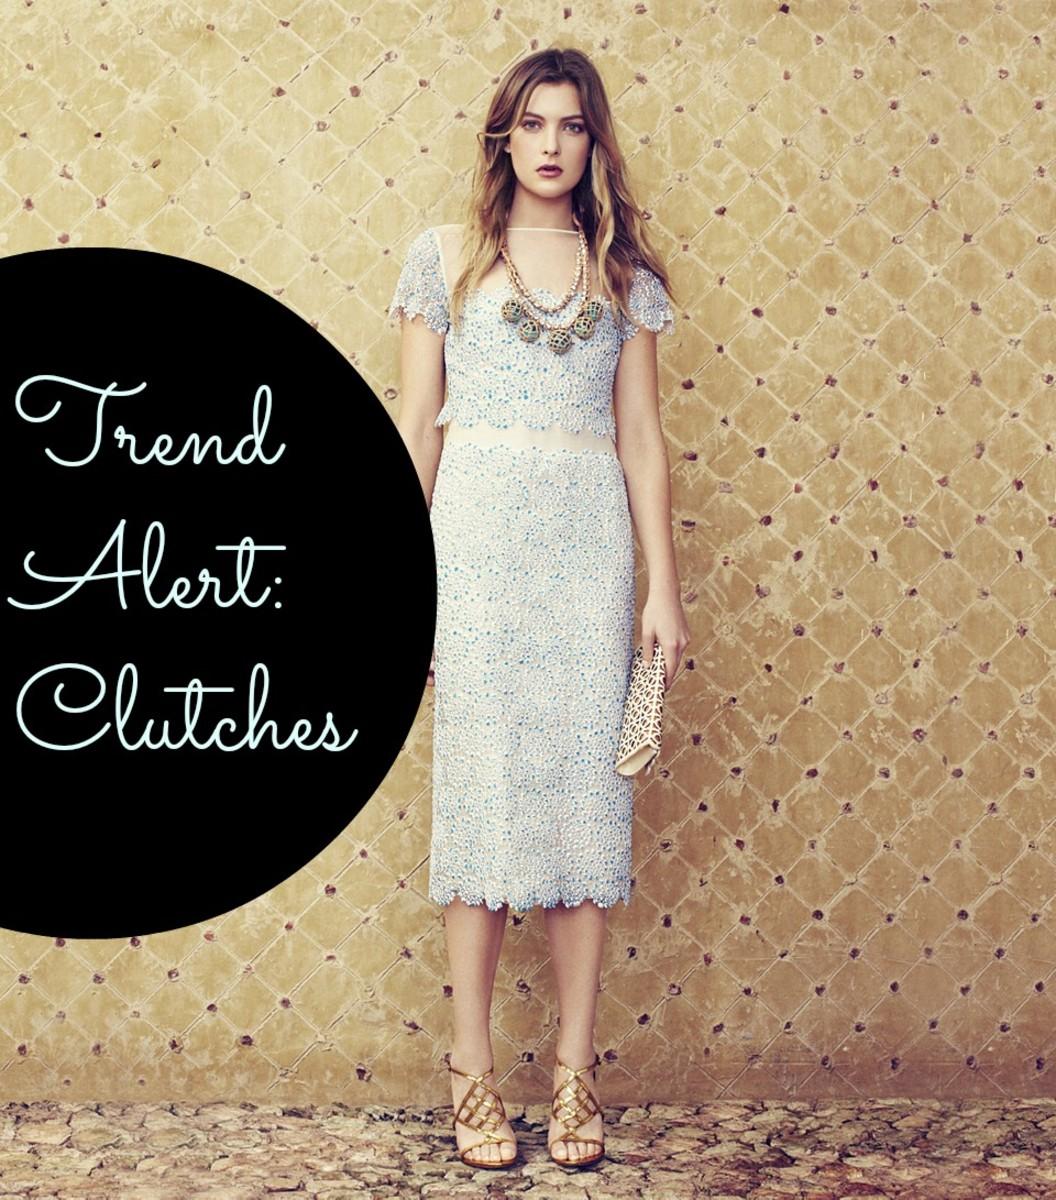 trend alert clutches